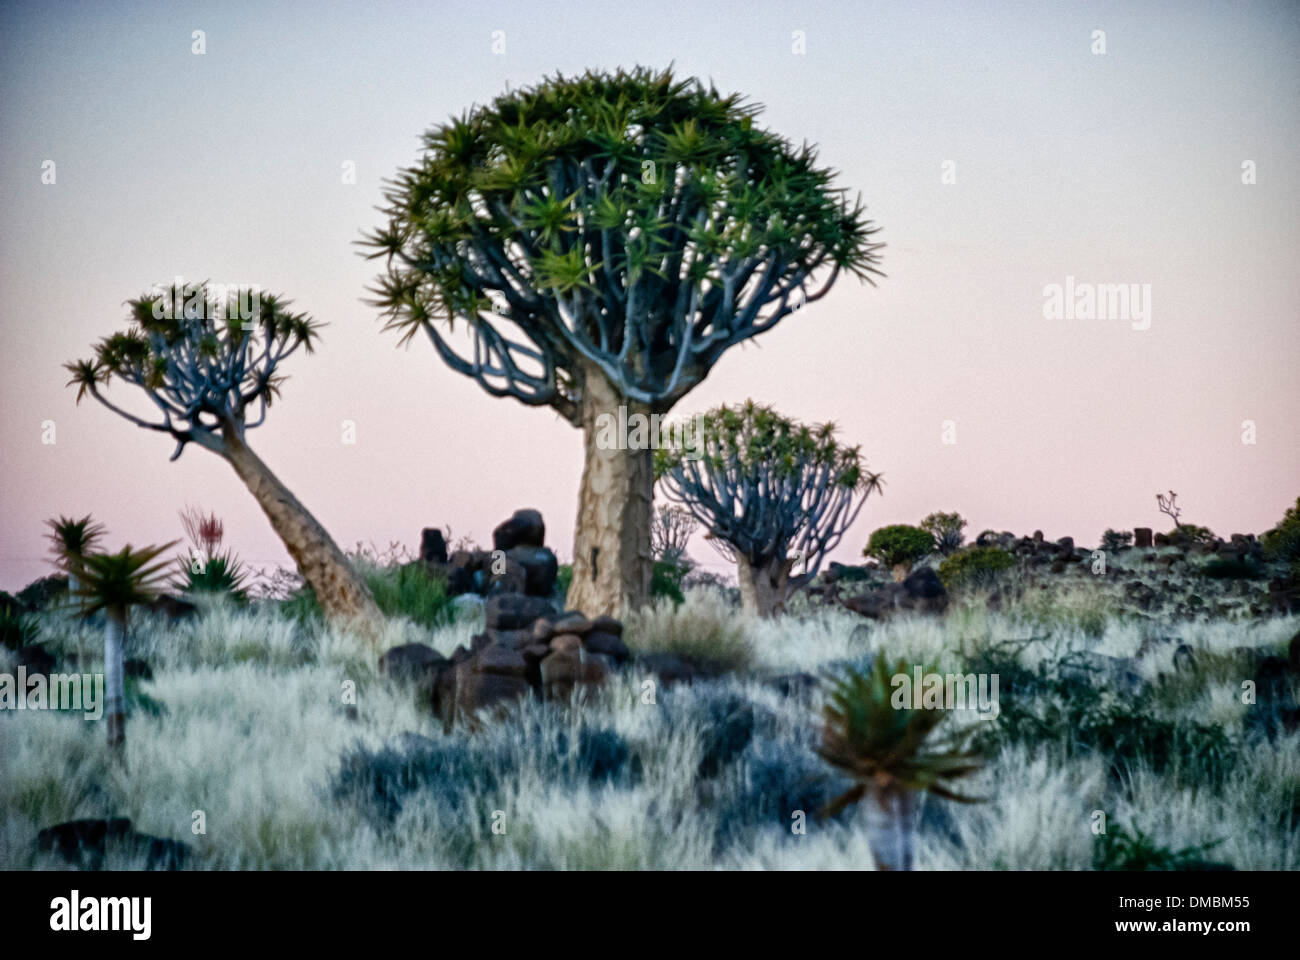 Zittern Sie Bäume, Kokerboom, Aloe Dichotoma, zucken Sie Baum Wald, Farm Gariganus Keetmannshoop, Namibia, Stockbild